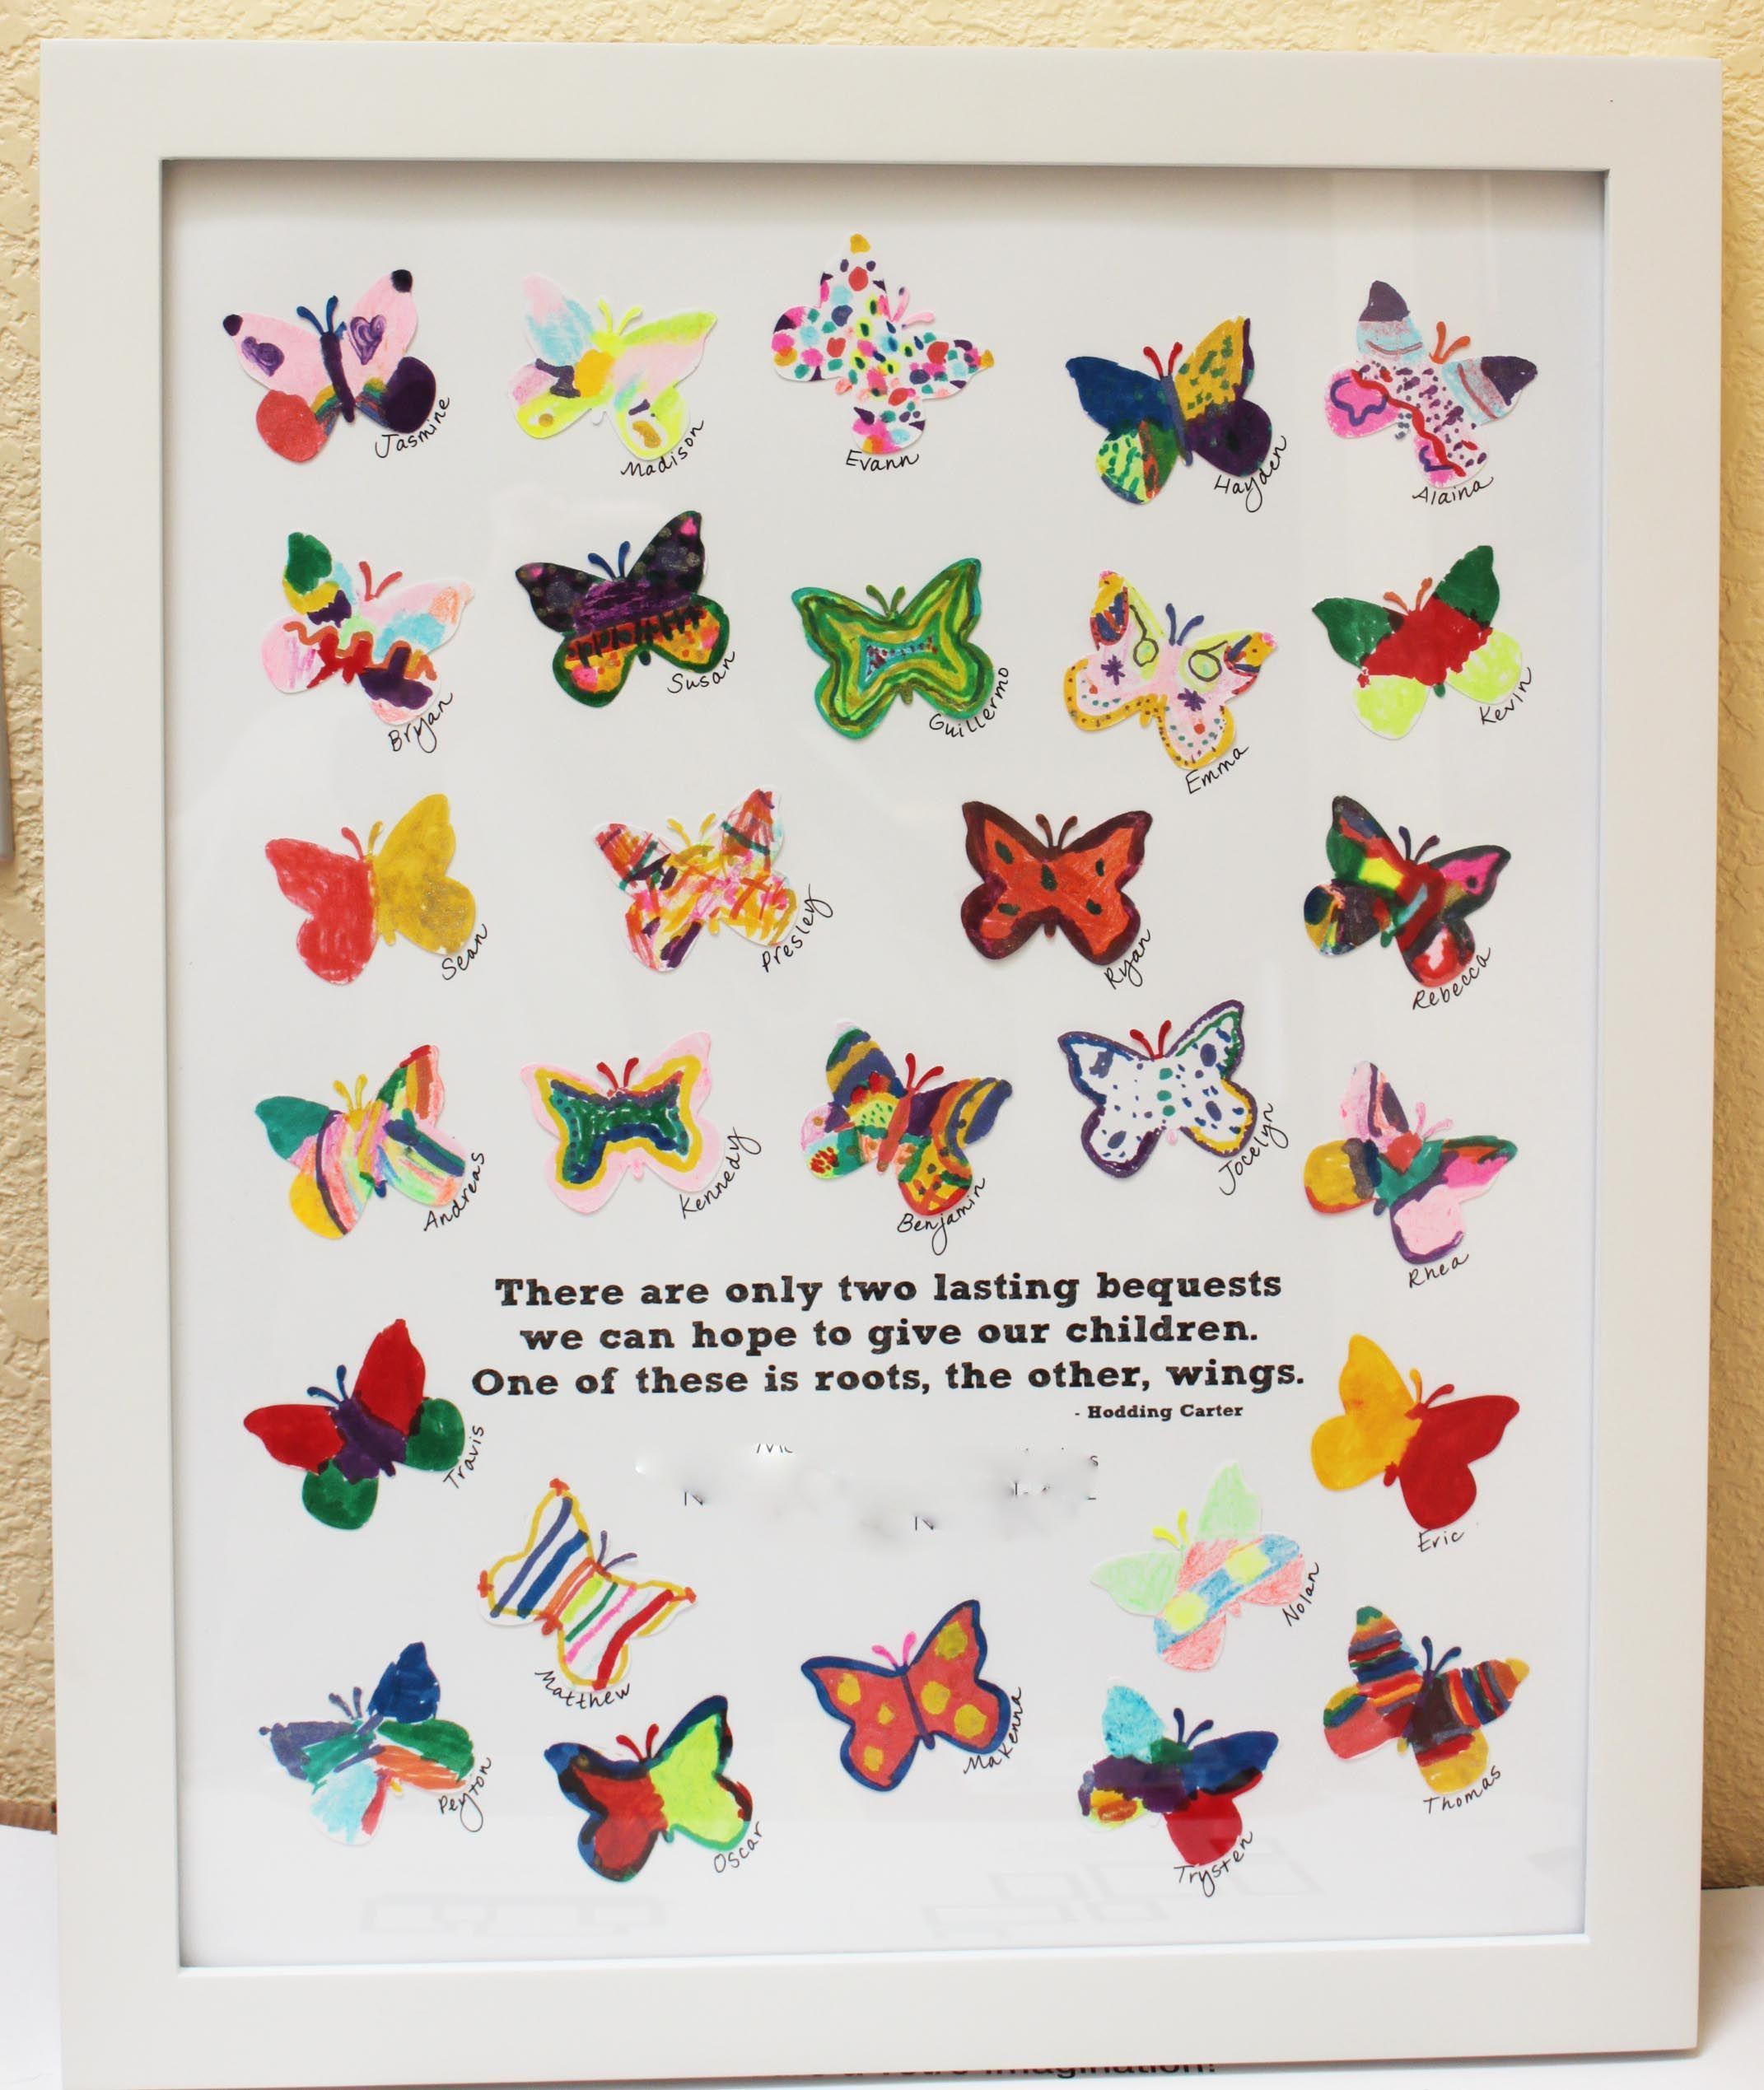 School auction art project the white paper butterflies for White paper butterflies